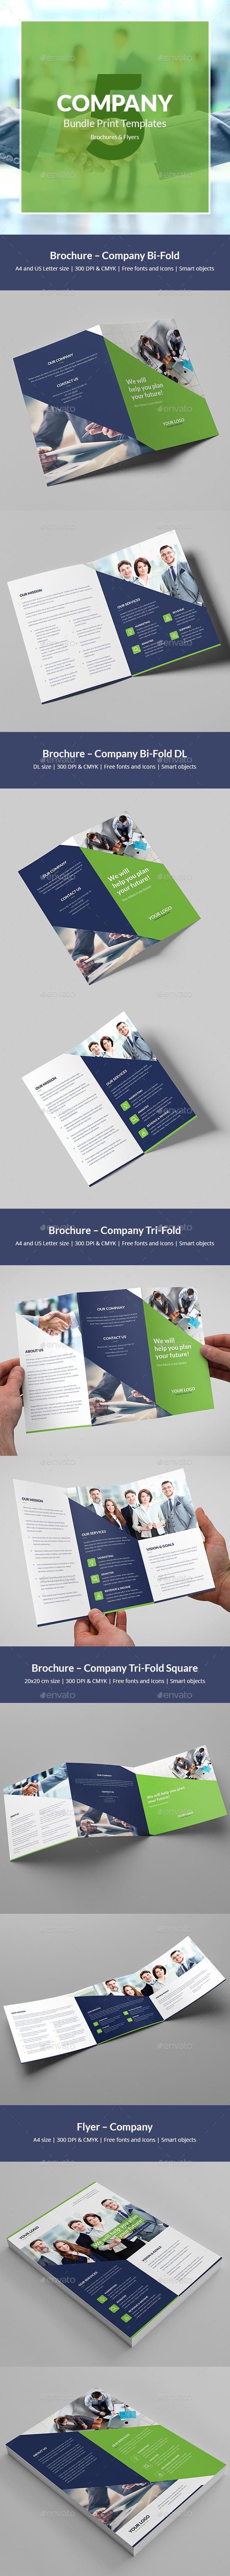 Company – Brochures Bundle Print Templates 5 in 1 - Corporate Brochures